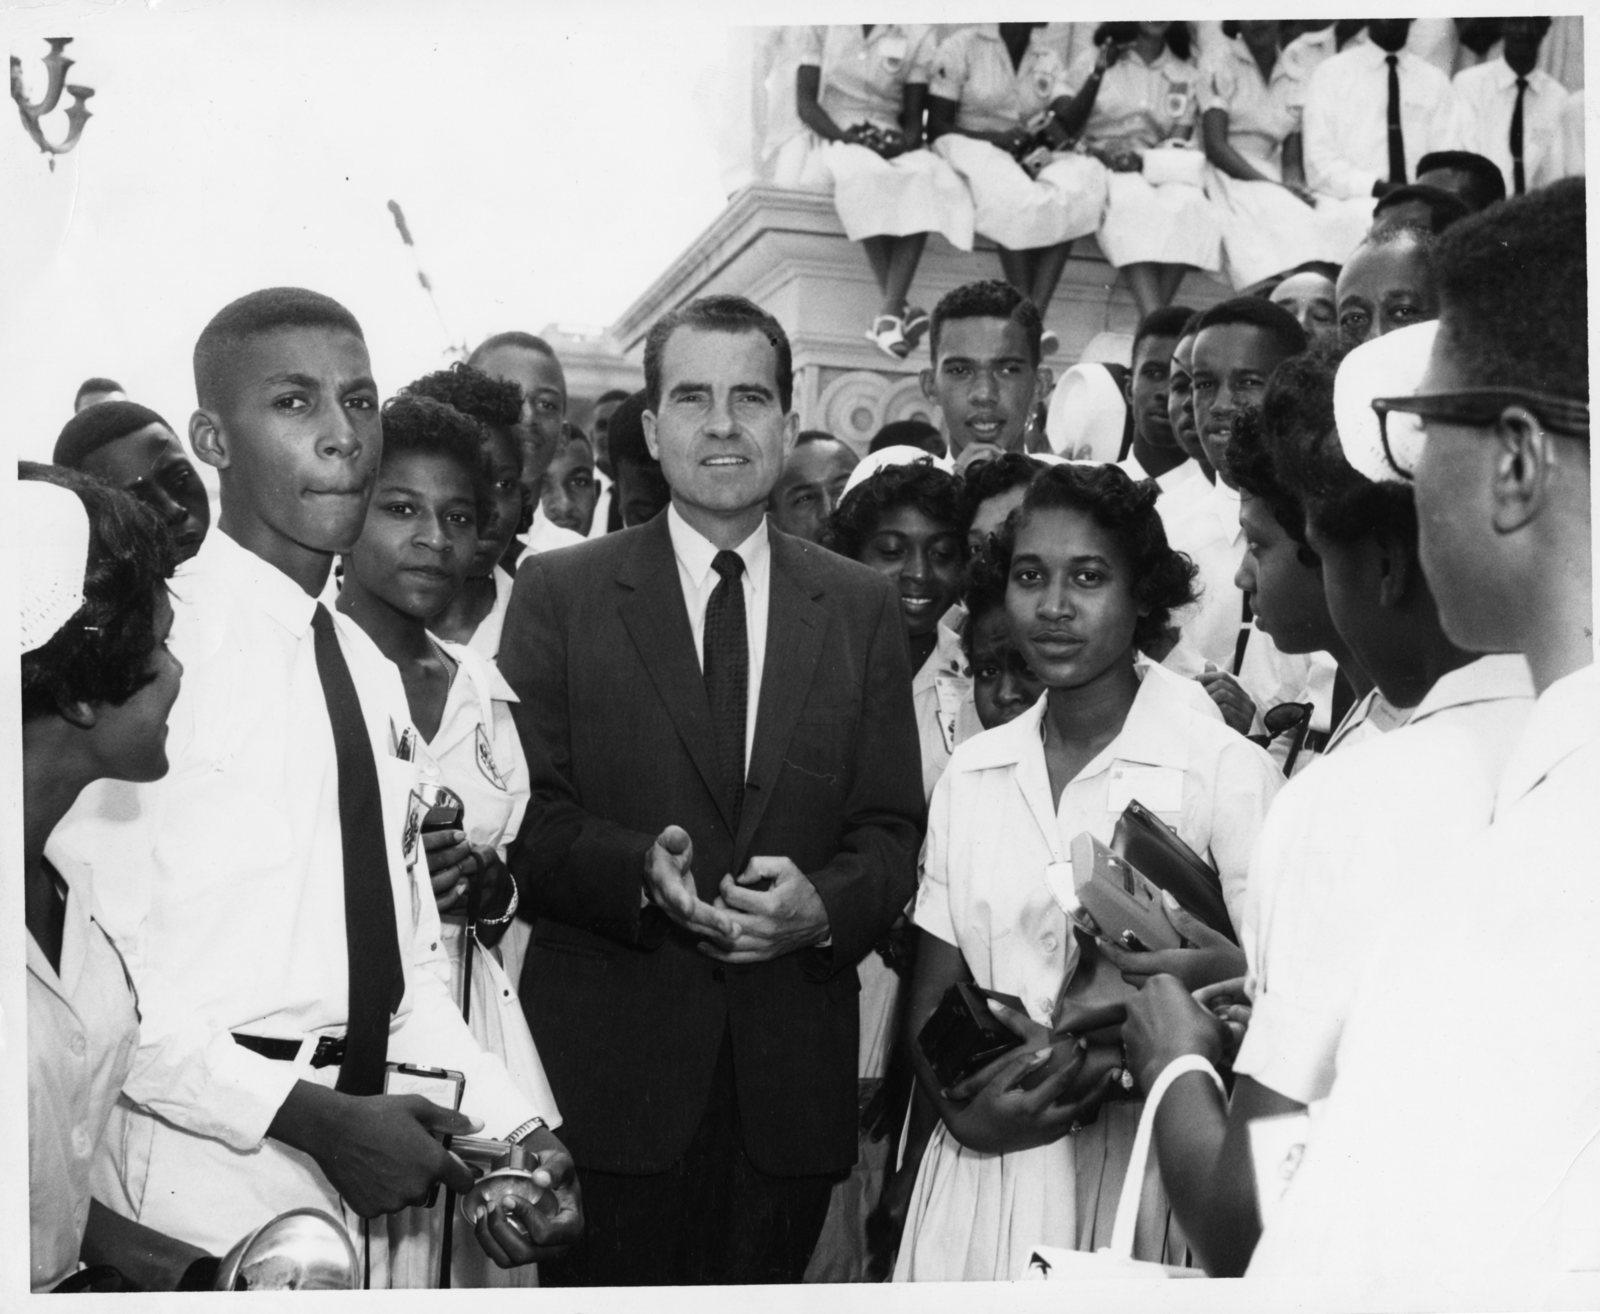 Richard Nixon stands amongst a group of 4-H members visiting Washington, D.C